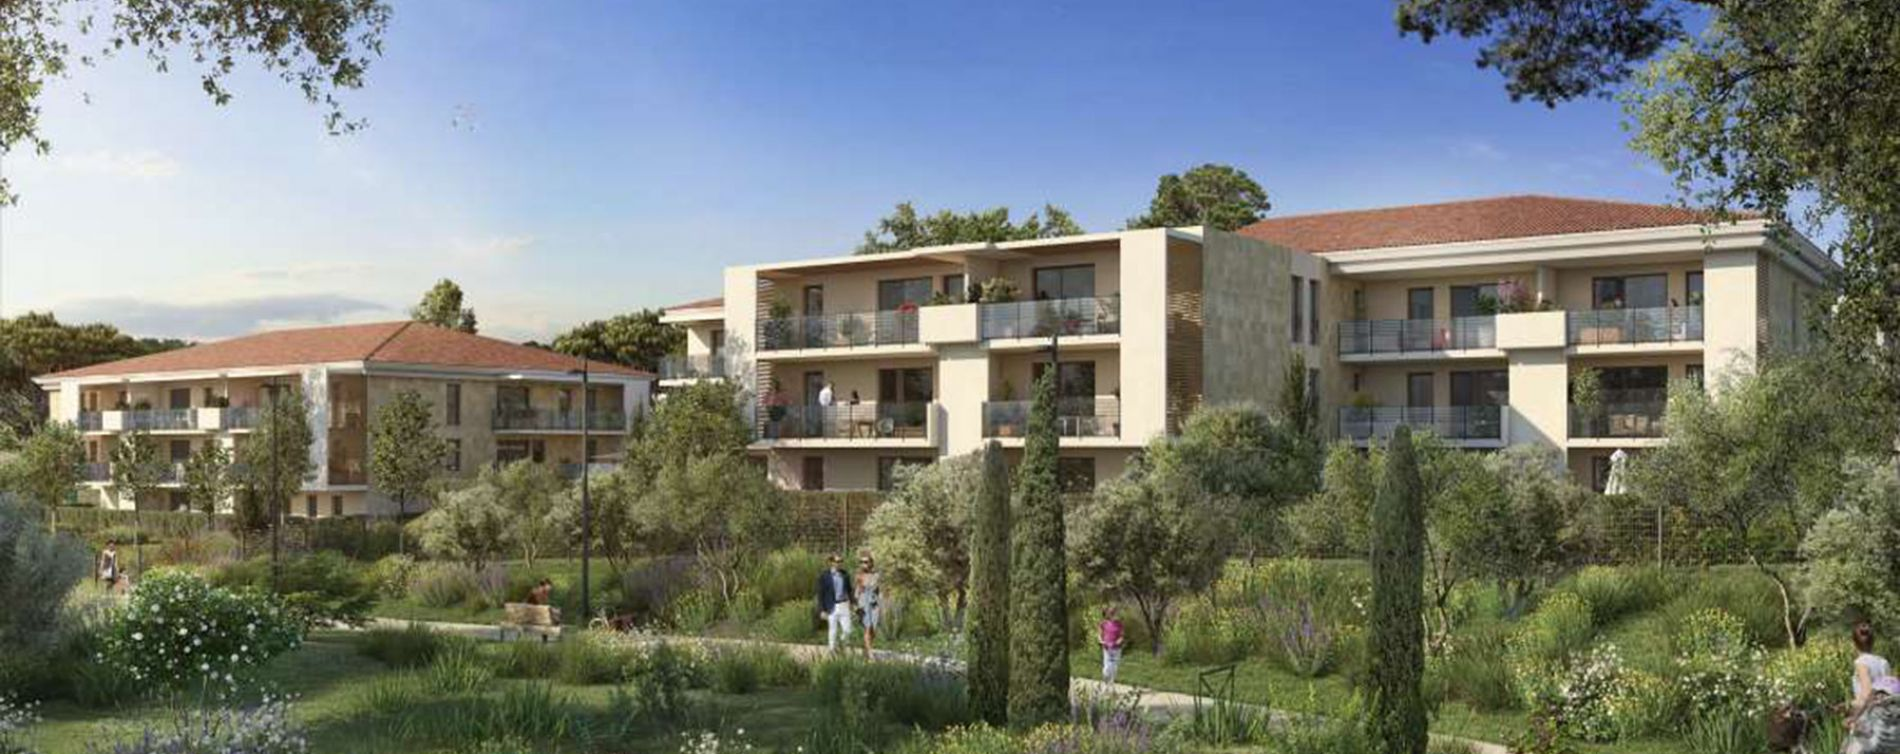 Résidence Villa Oleia à Aix-en-Provence